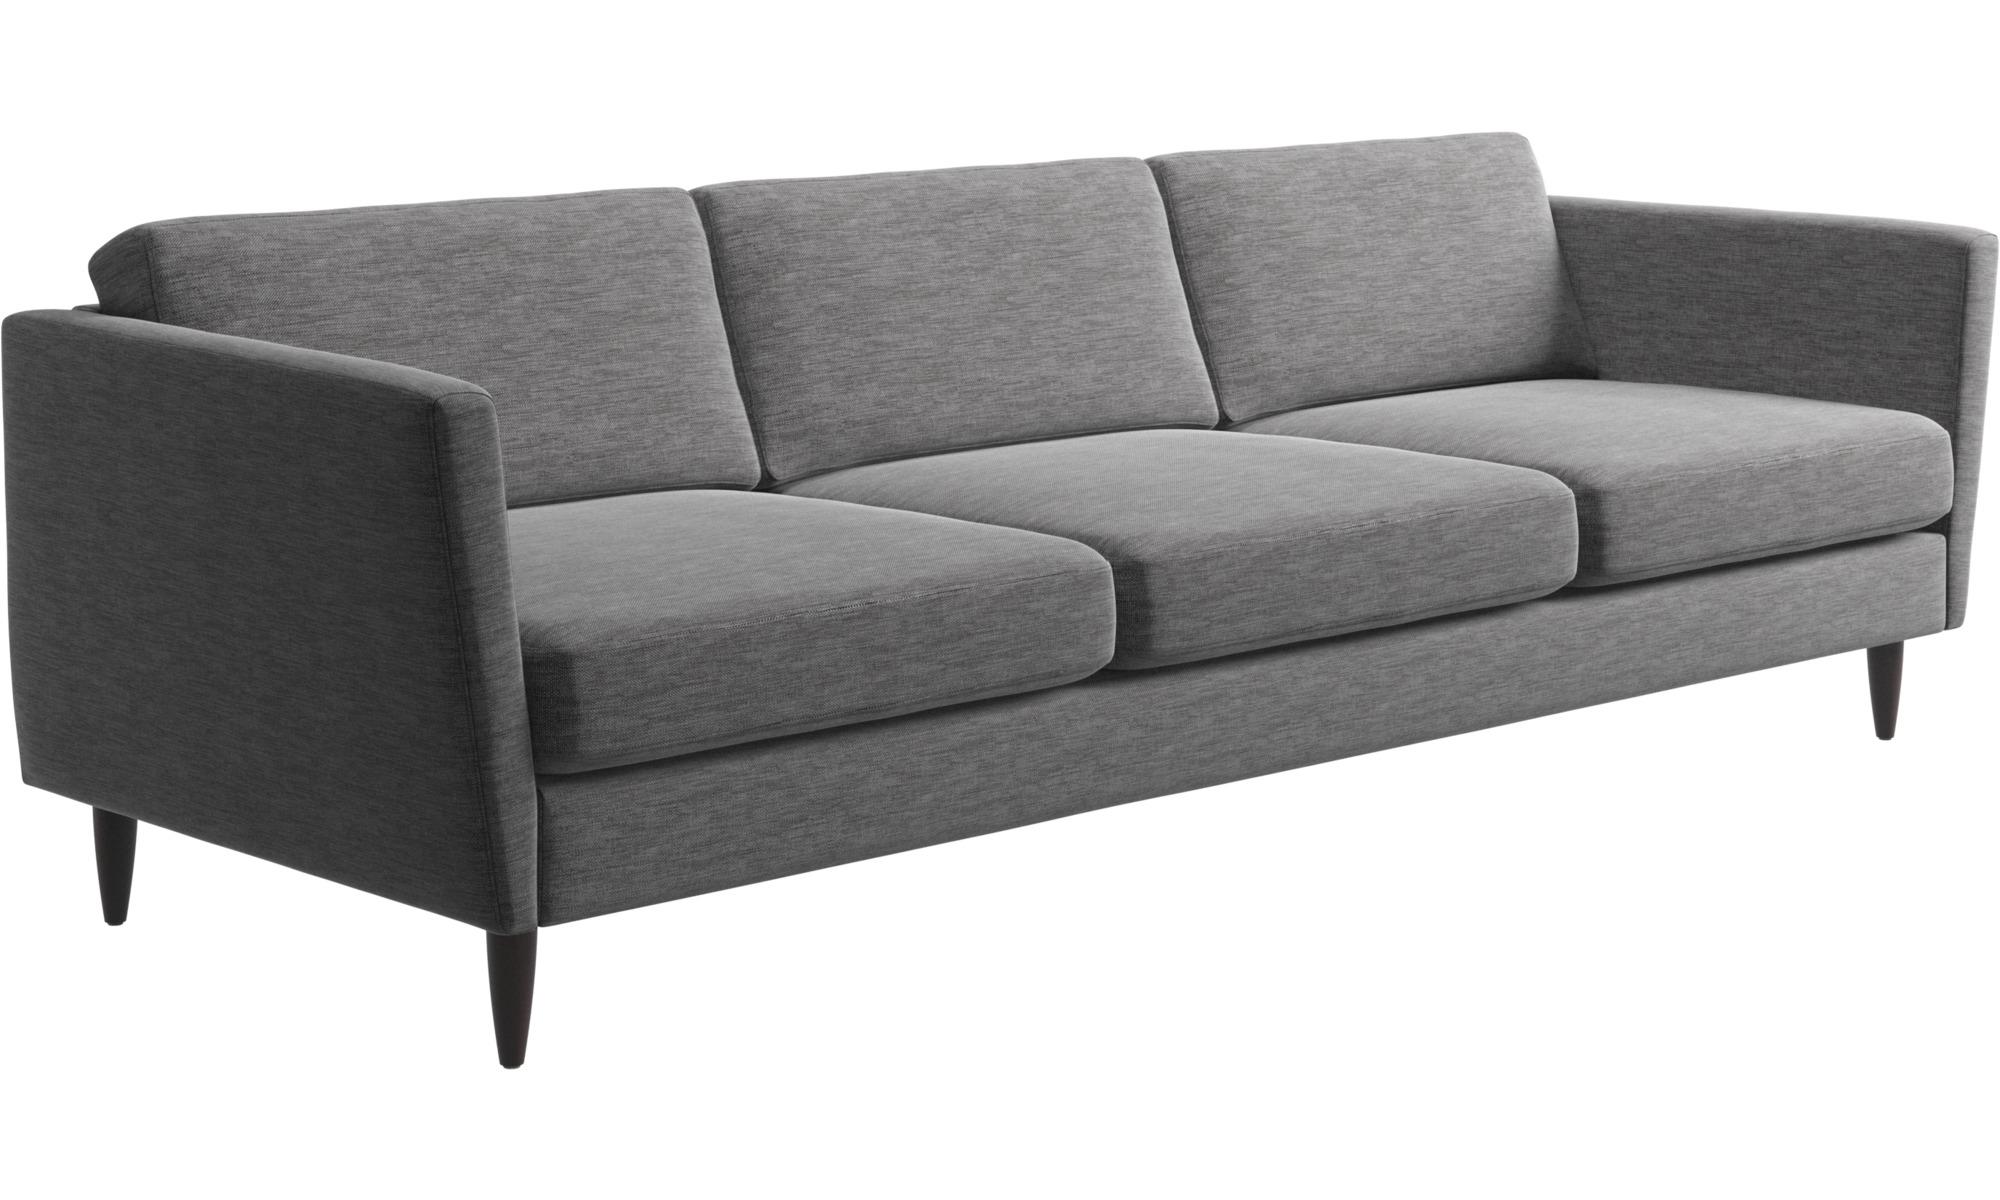 canap canap osaka assise classique boconcept. Black Bedroom Furniture Sets. Home Design Ideas